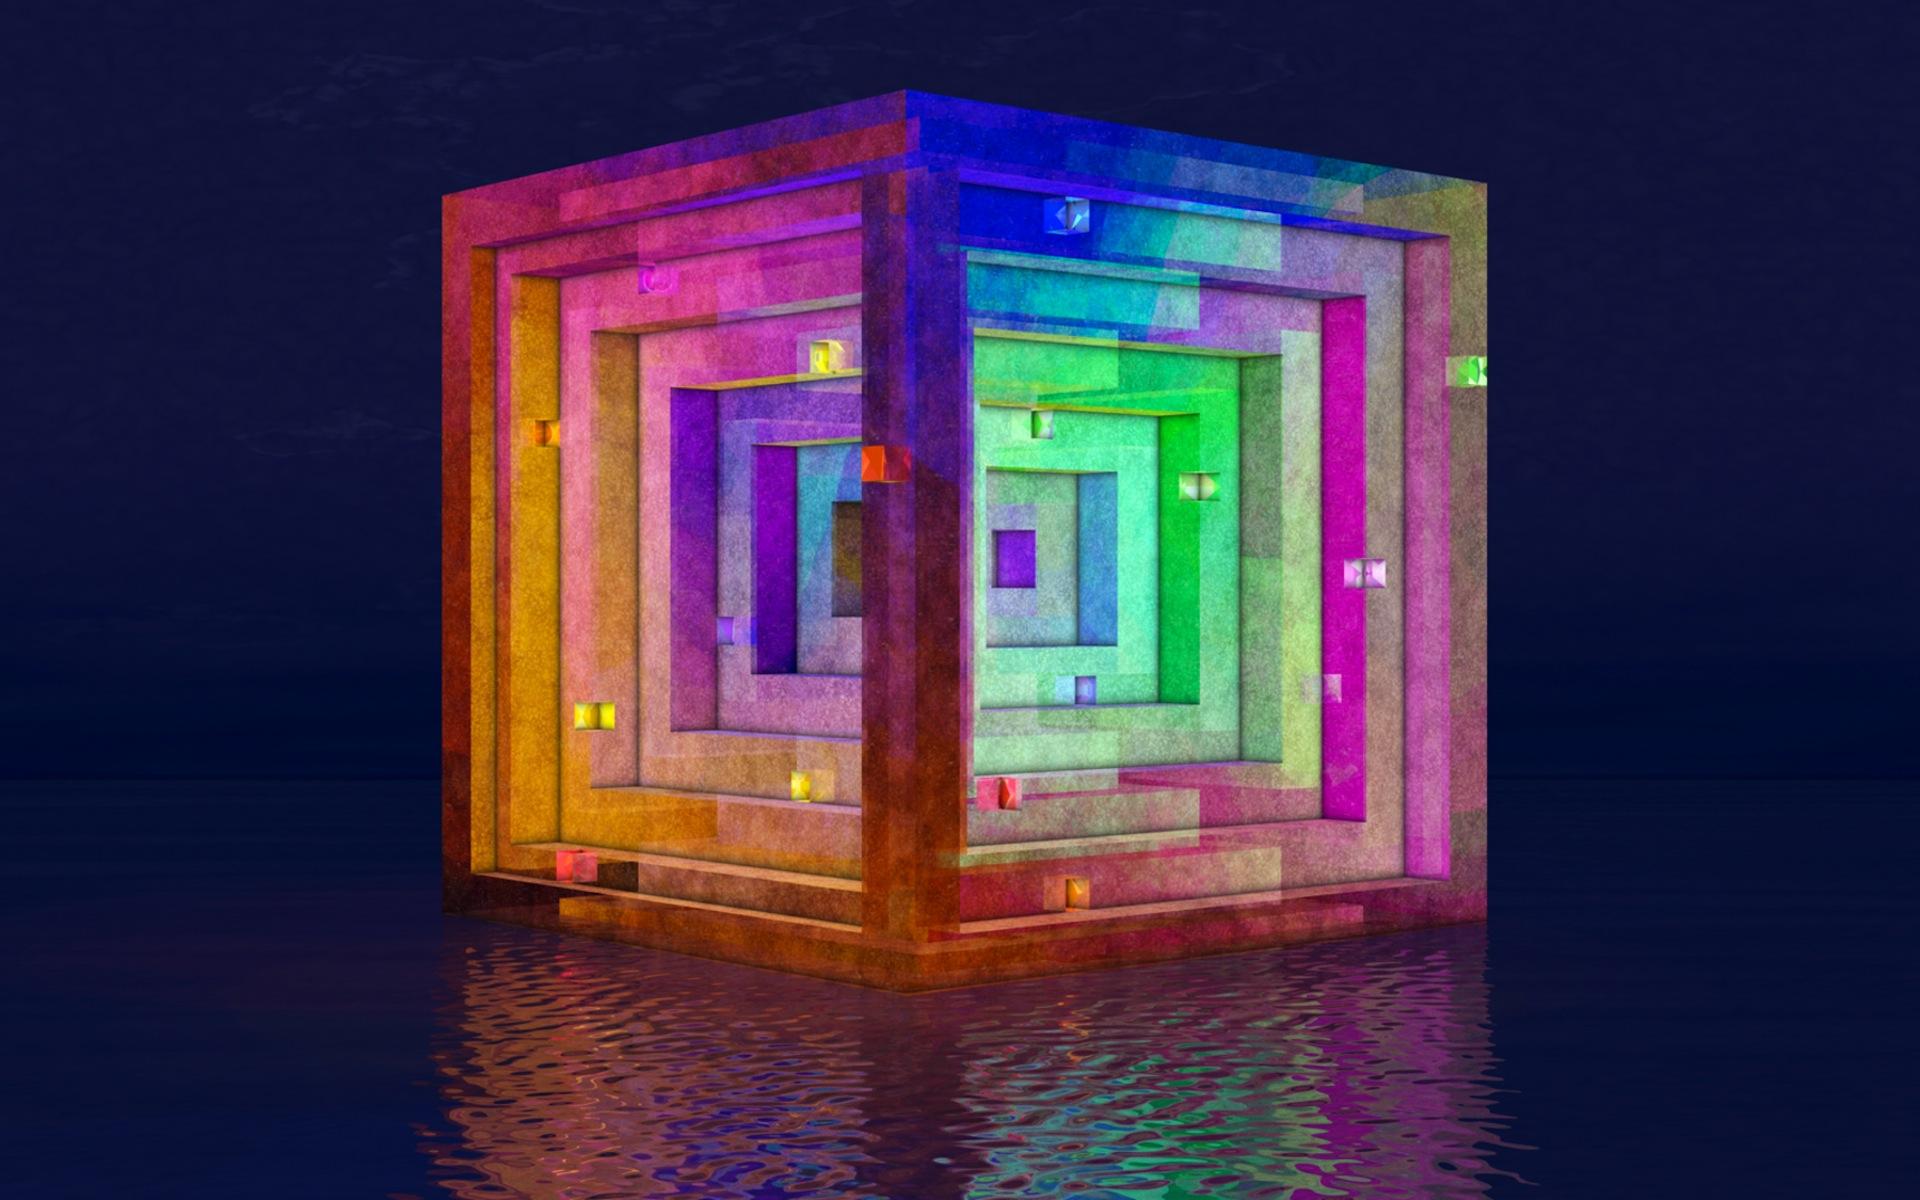 cube computer wallpapers desktop - photo #18